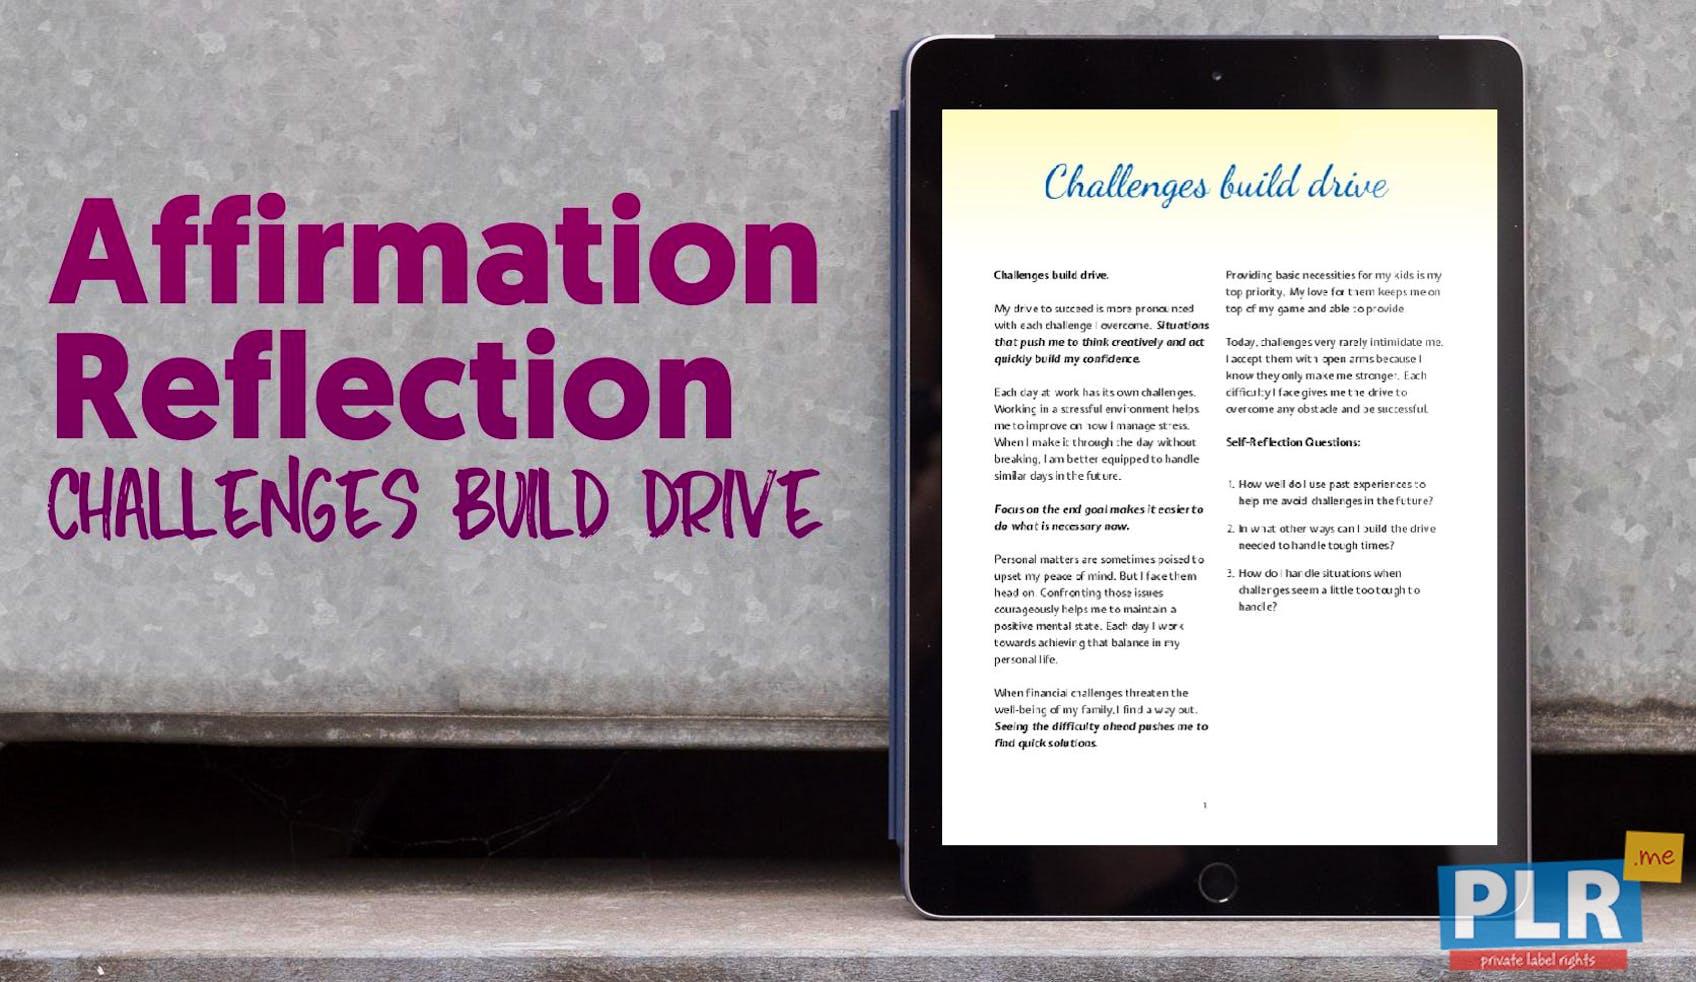 Challenges Build Drive